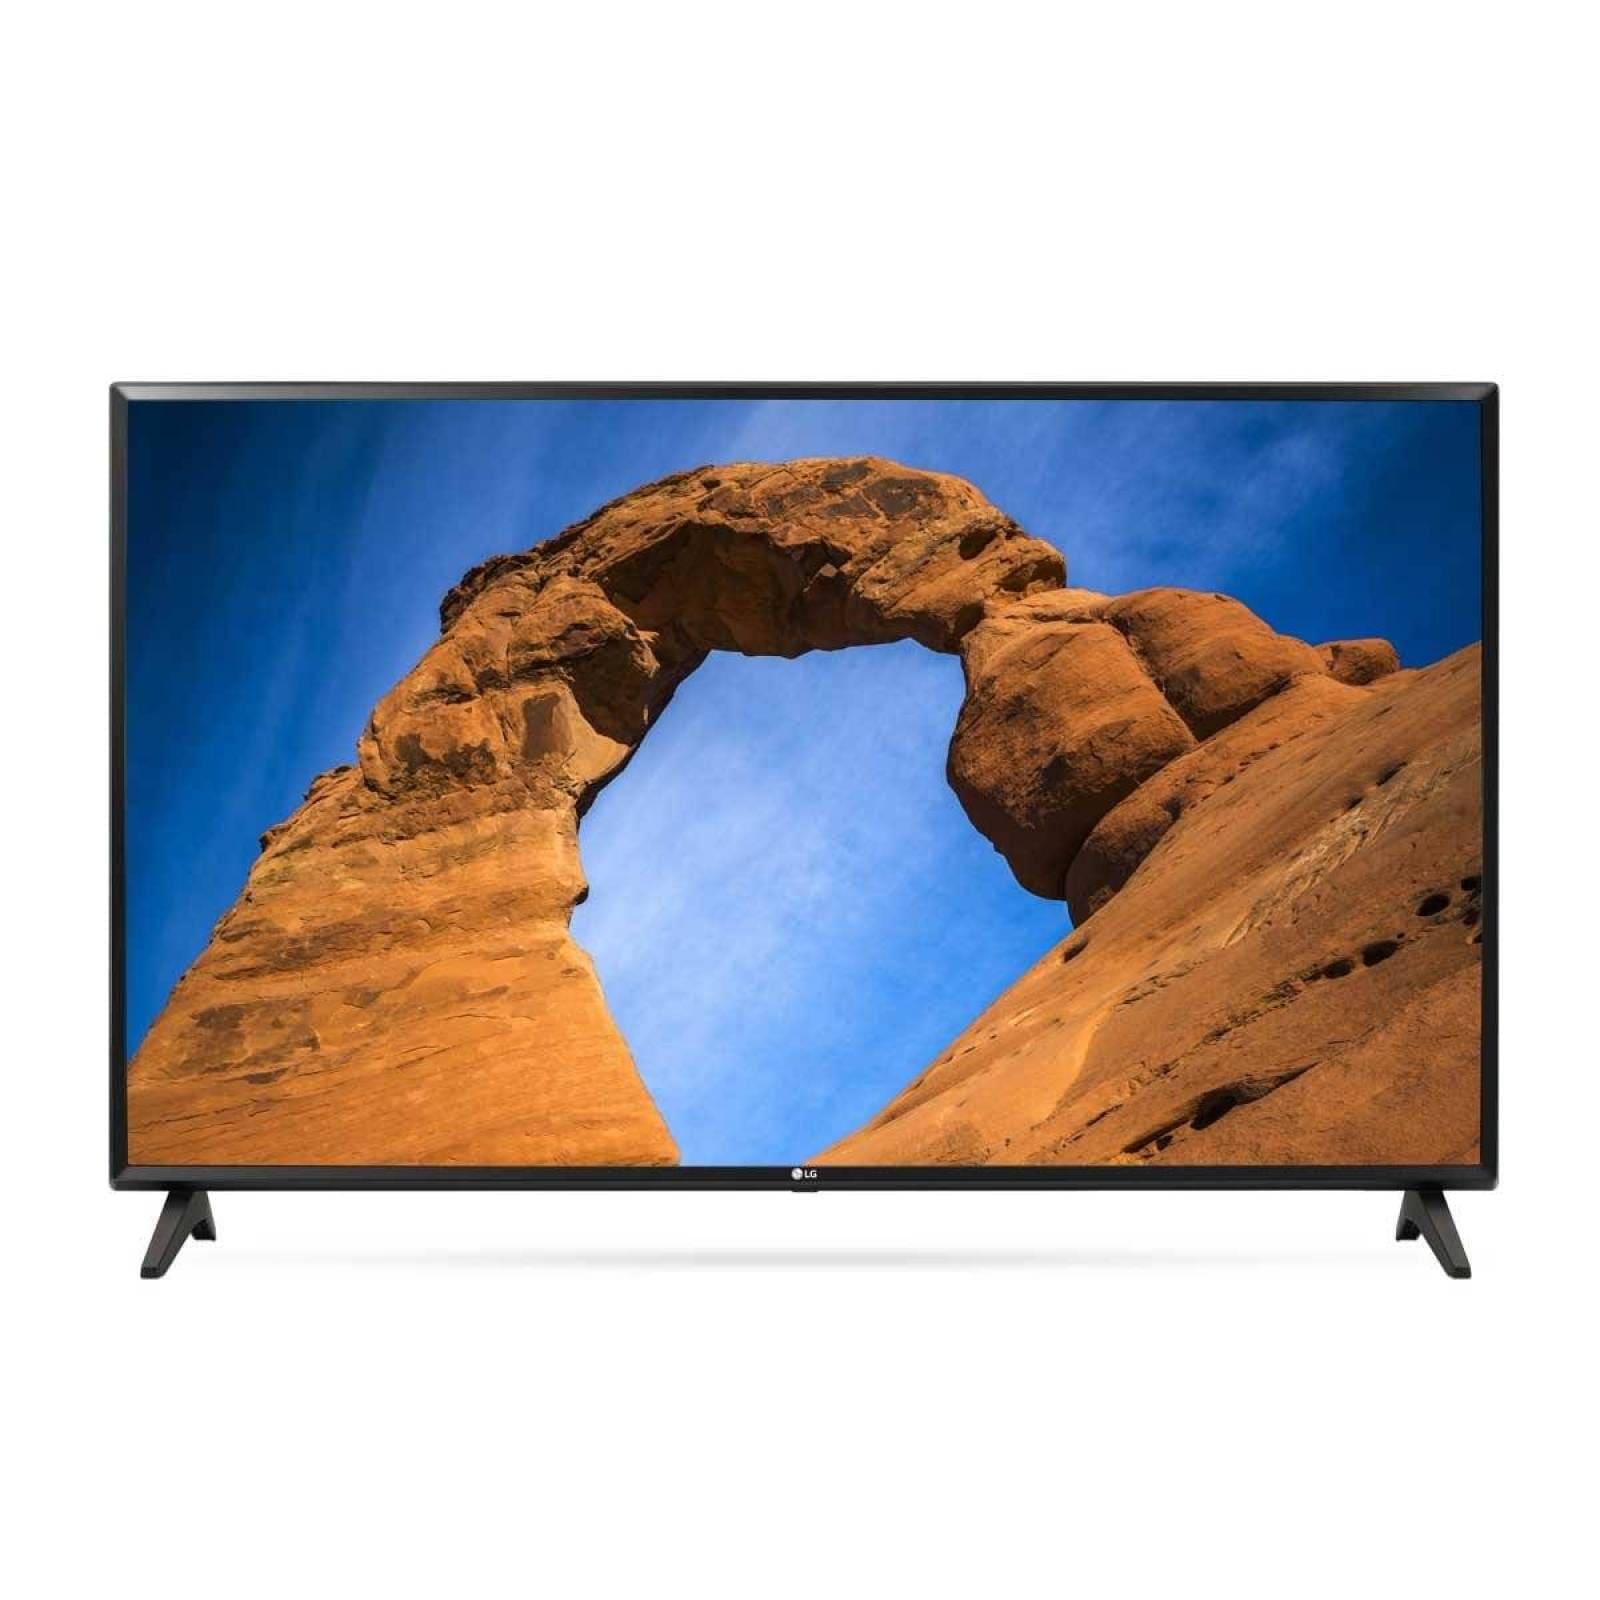 Televisi?n LED LG 43 Pulgadas FHD Smart Tv WebOS 3.5